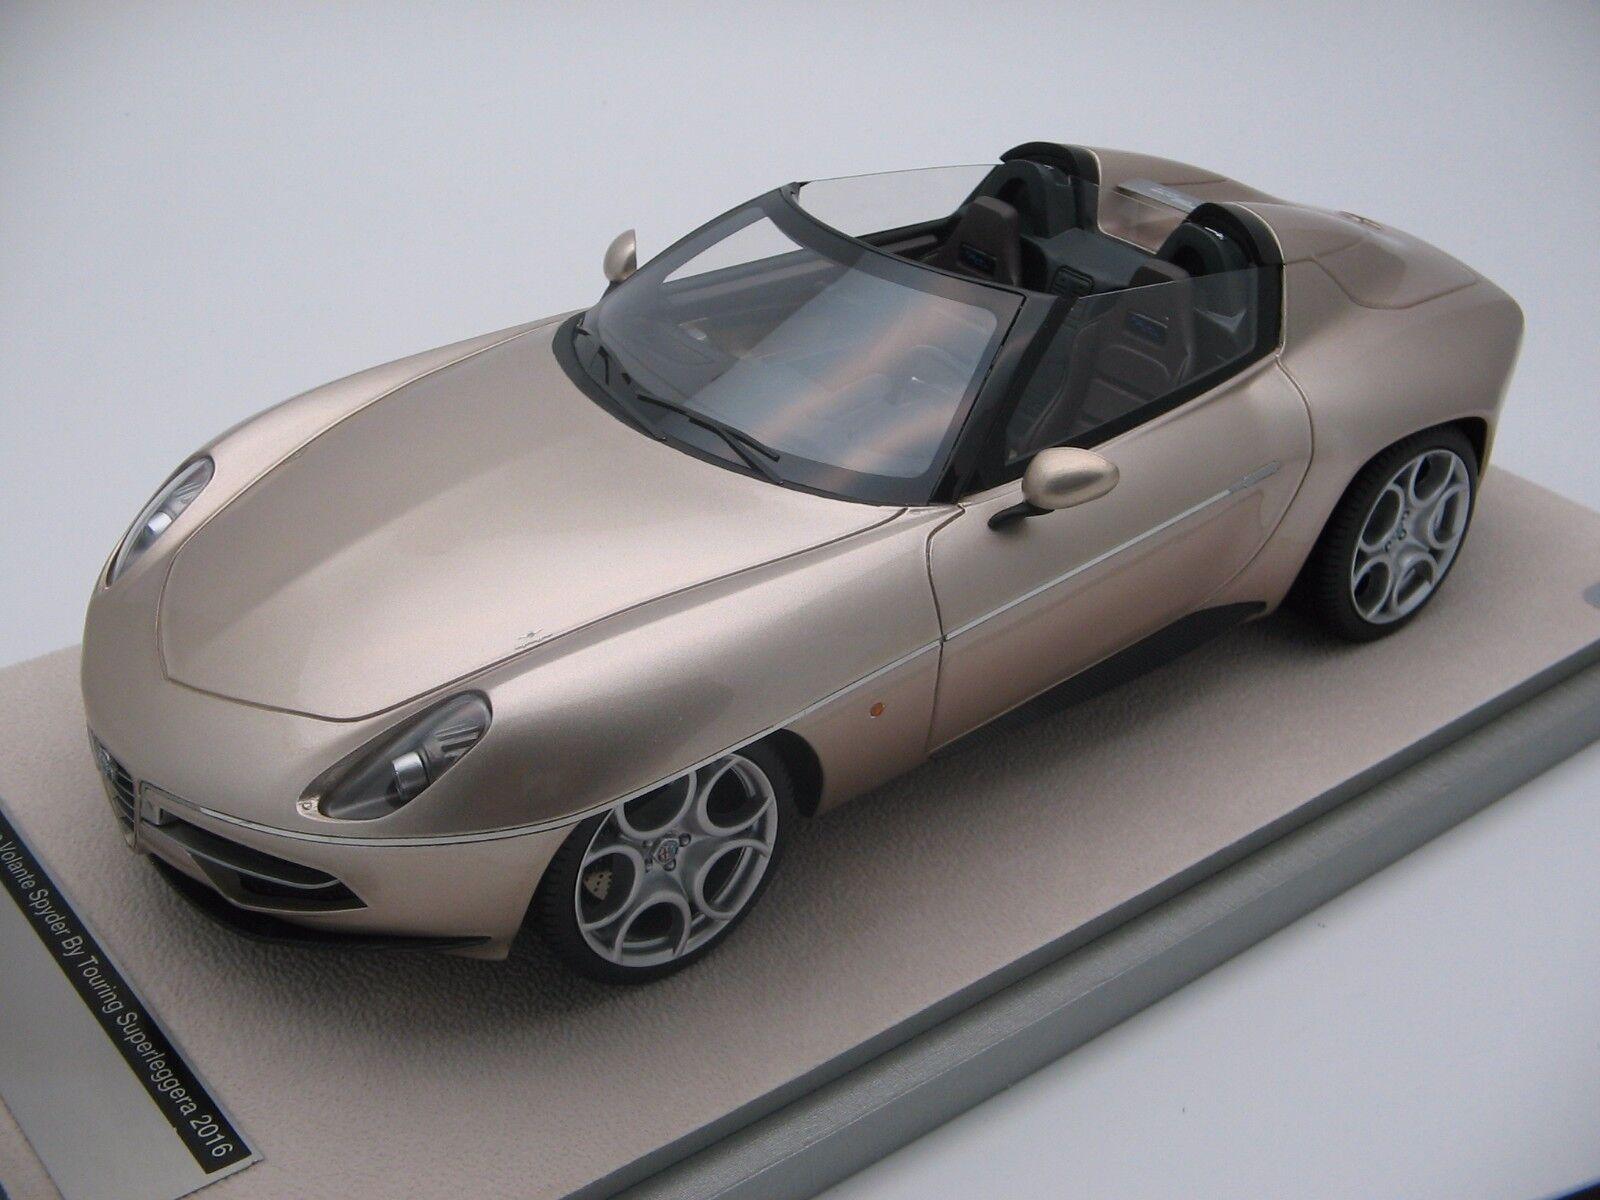 1 18 Échelle Tecnomodel Alfa Romeo Disque Volant Spyder By Touring Tm18-68d